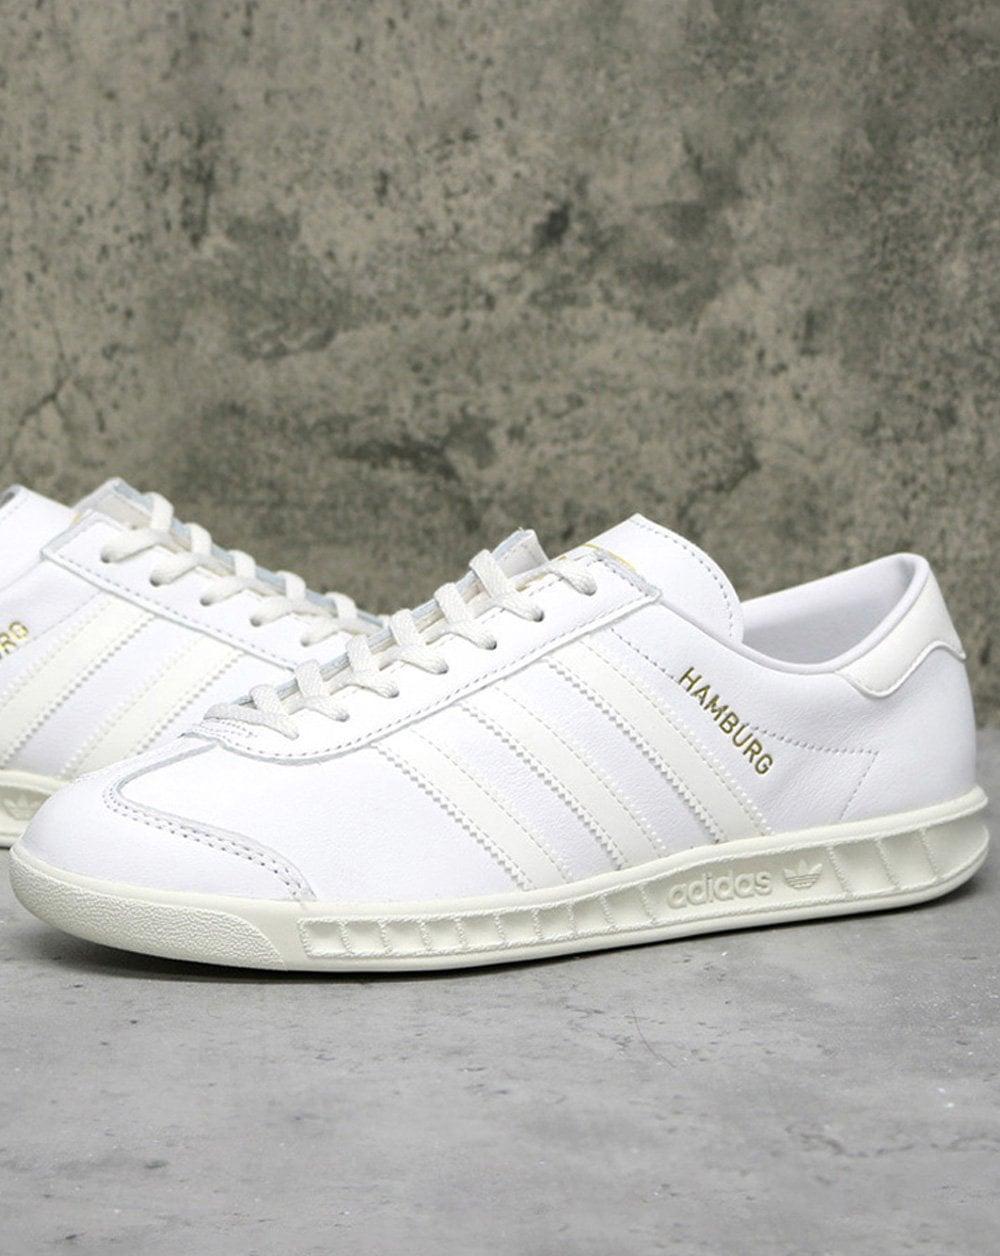 Adidas Hamburg Leather Trainers White